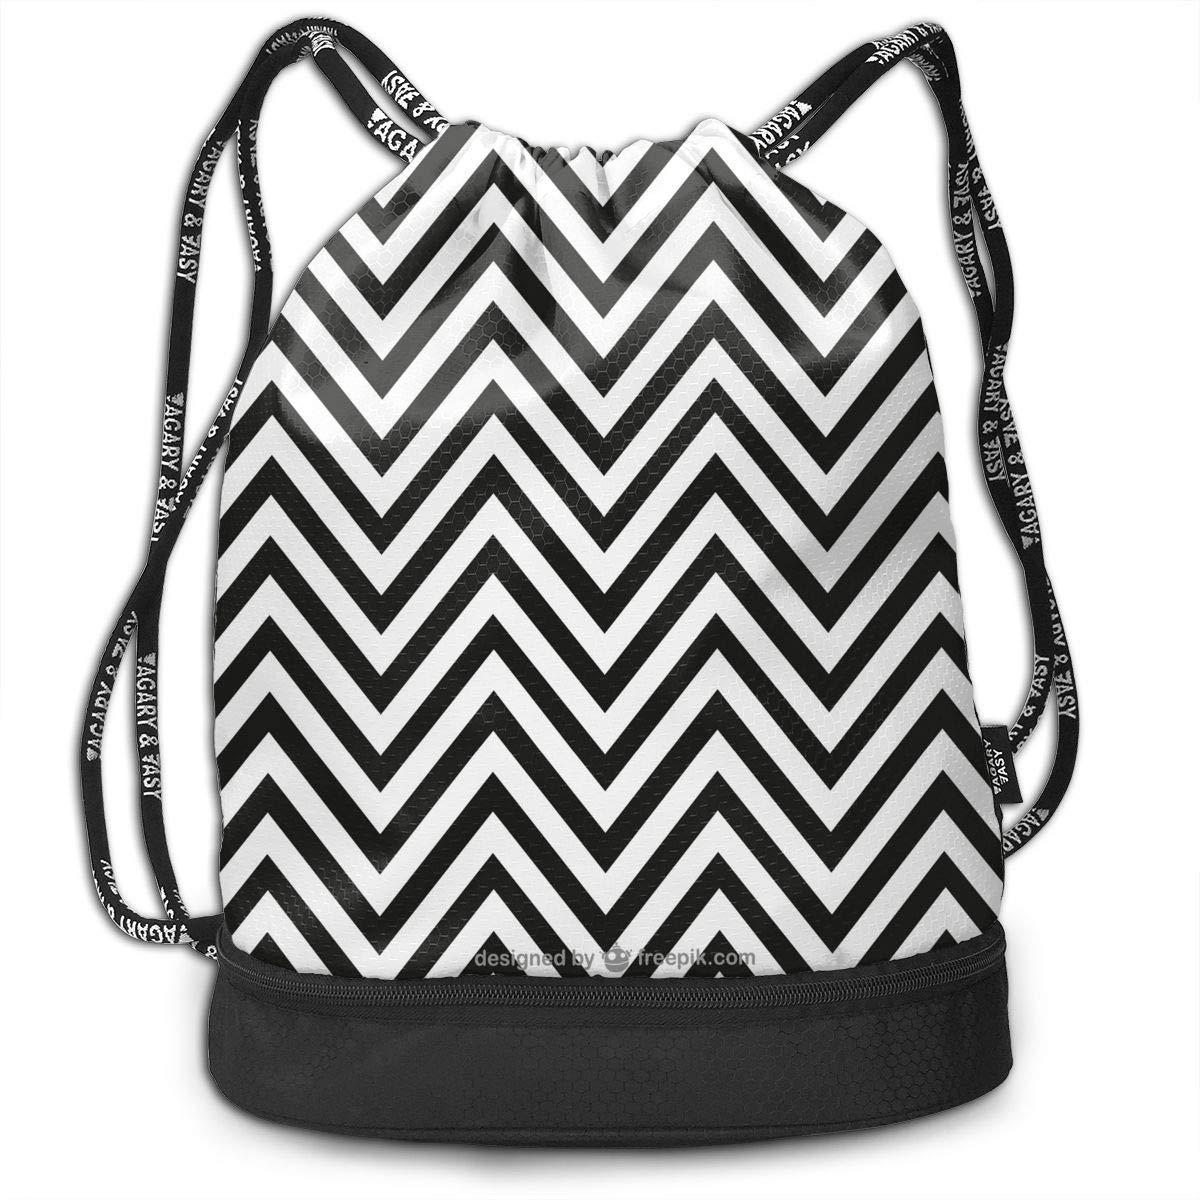 Zol1Q Lightweight Waterproof Large Storage Drawstring Bag for Men /& Women Black Wave Cinch Backpack Sackpack Tote Sack